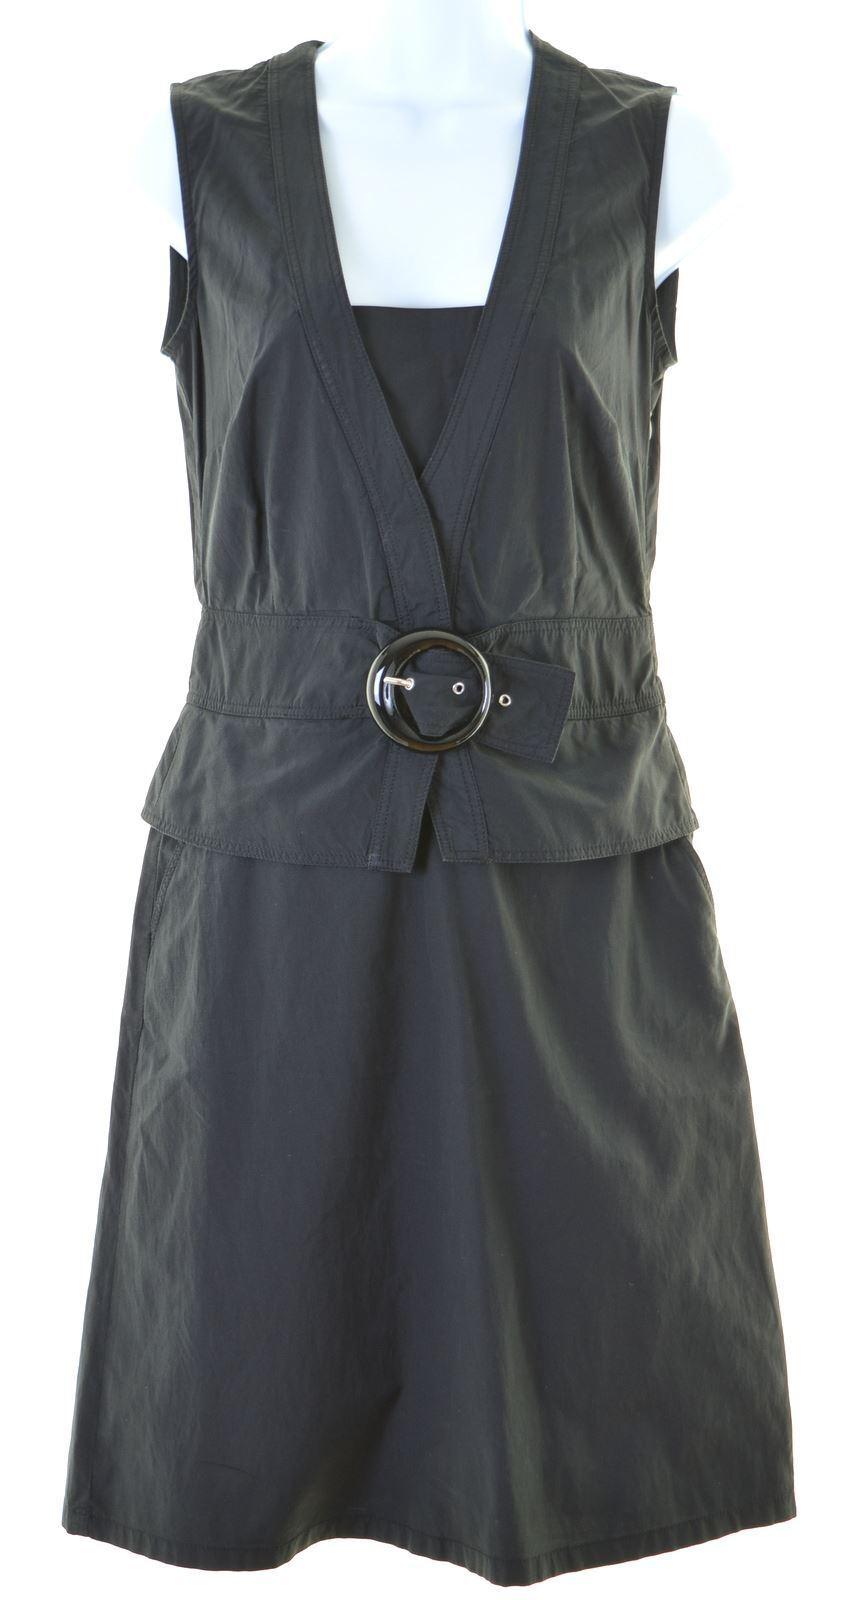 MOSCHINO damen Basic Dress UK 10 Small schwarz Polyester  EL03